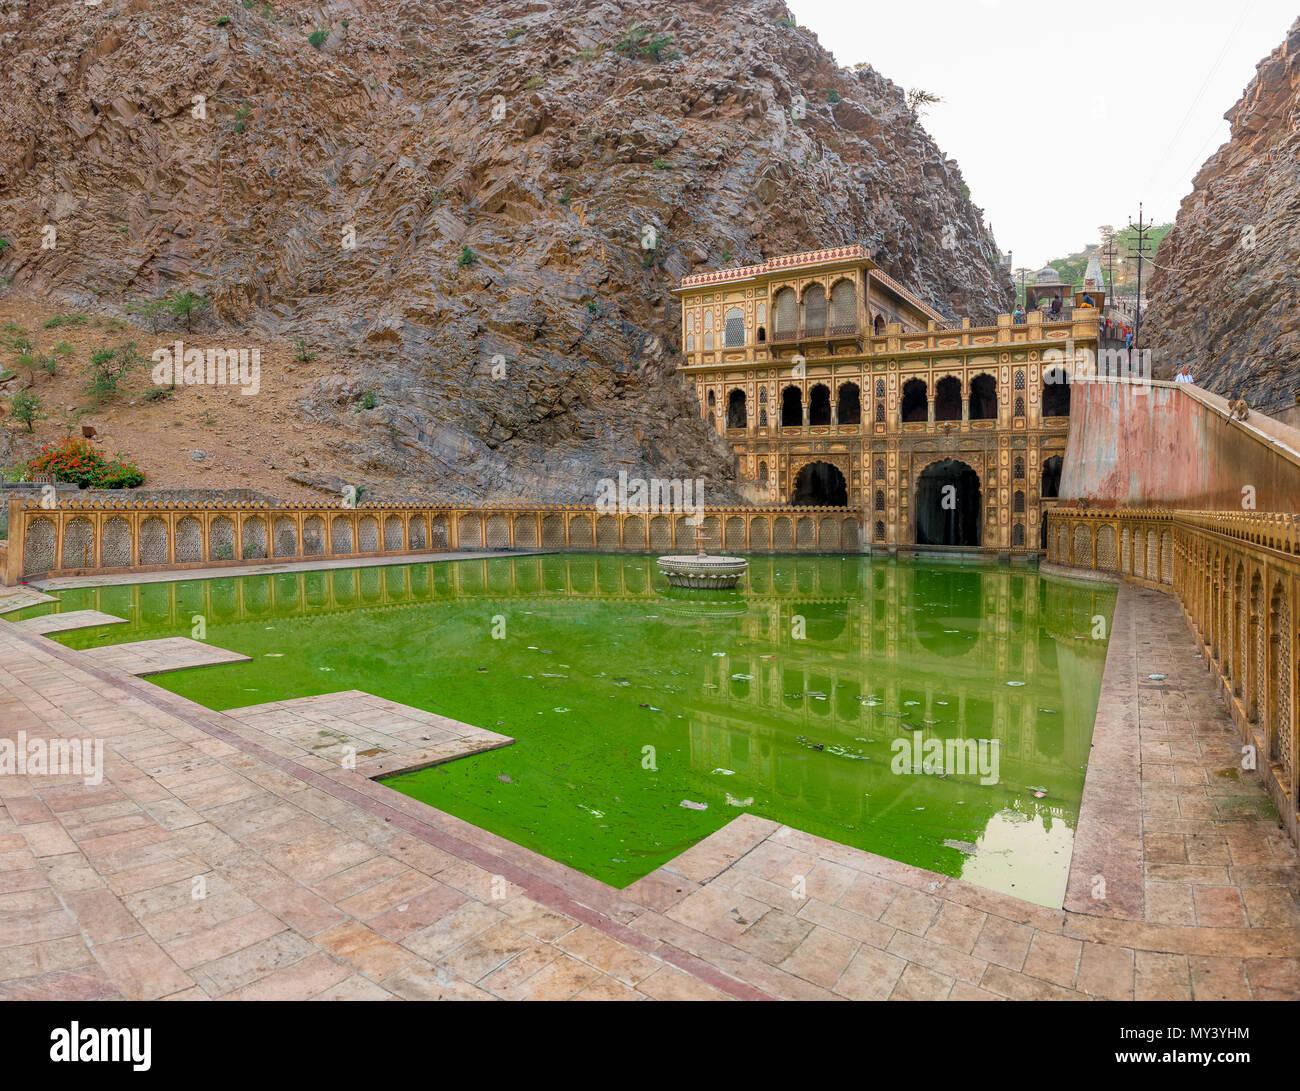 Galta Ji dans la banlieue de Jaipur Photo Stock